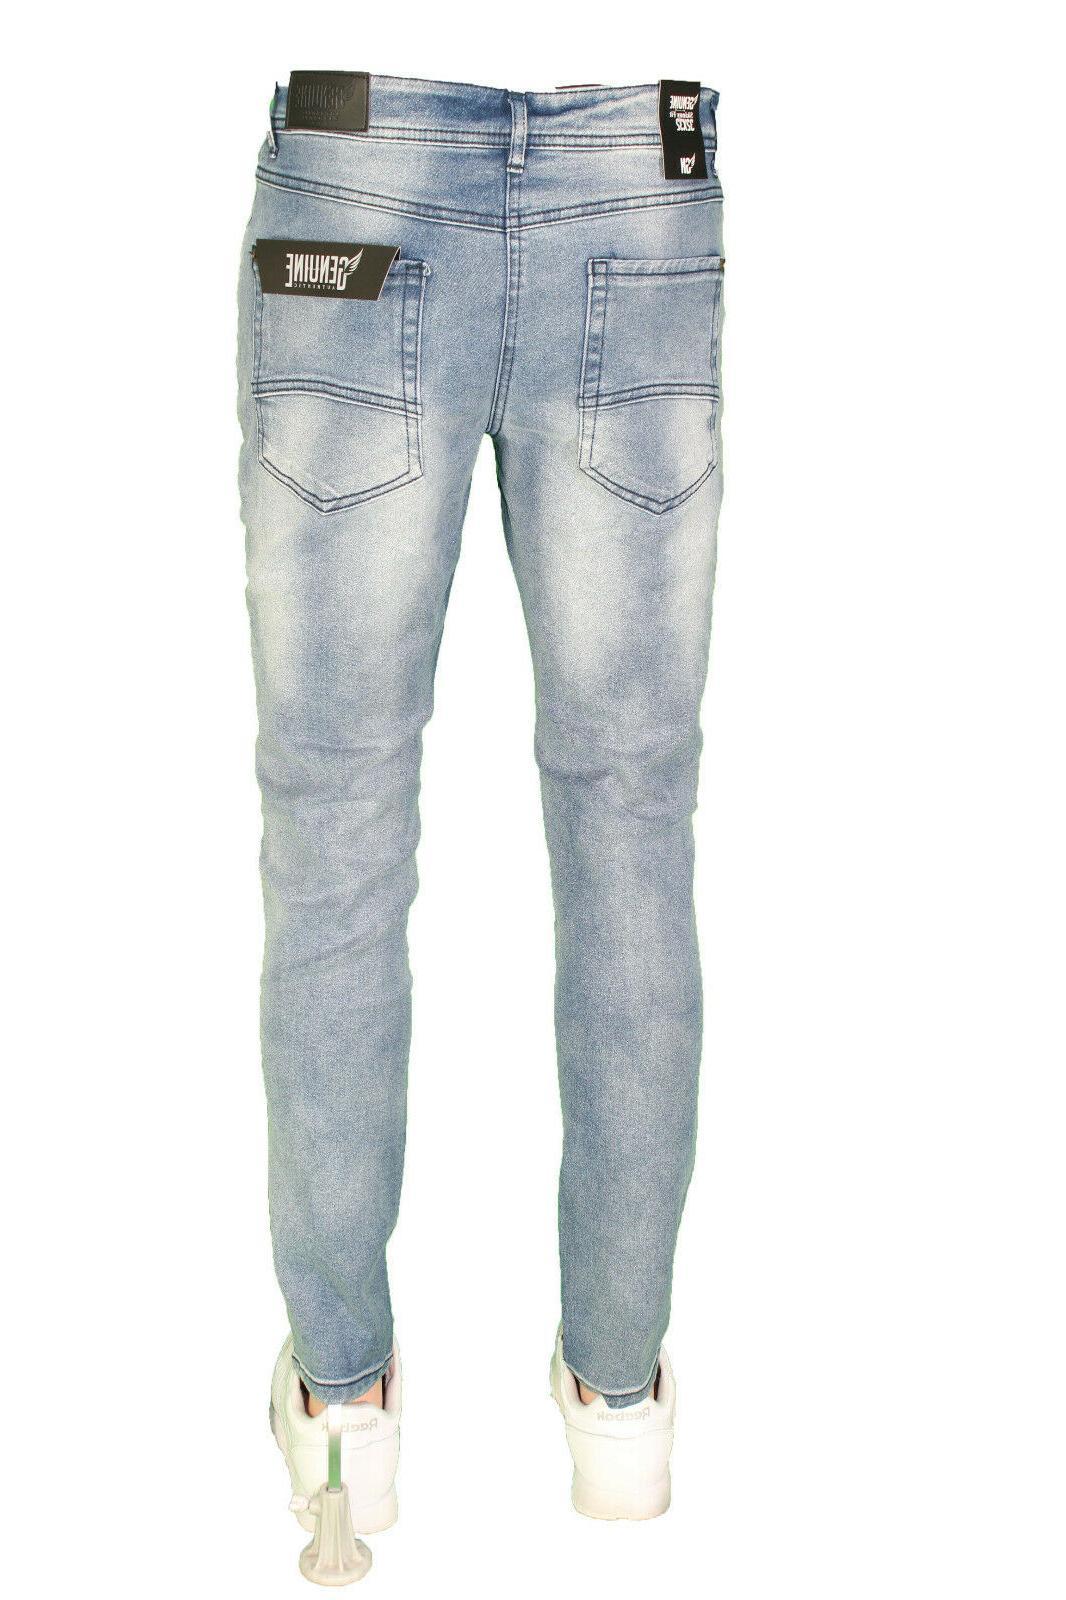 Men Slim Fit Super Stretch Pants Slim Skinny Casual Jeans